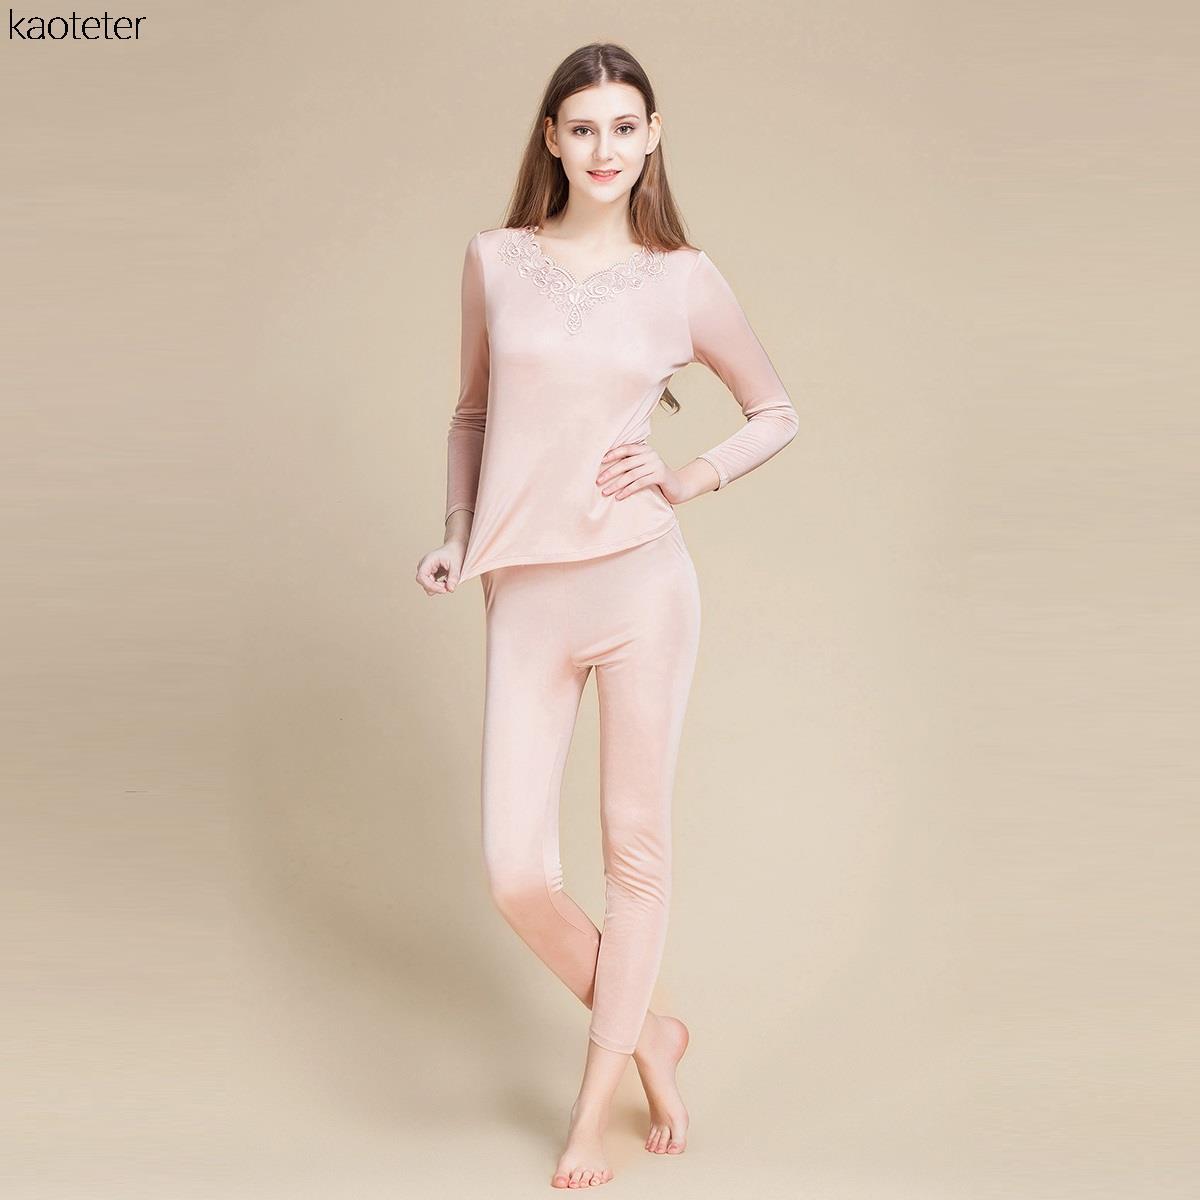 [gzxy0914]Fashion Contrast Color Half Sleeve Round Neck